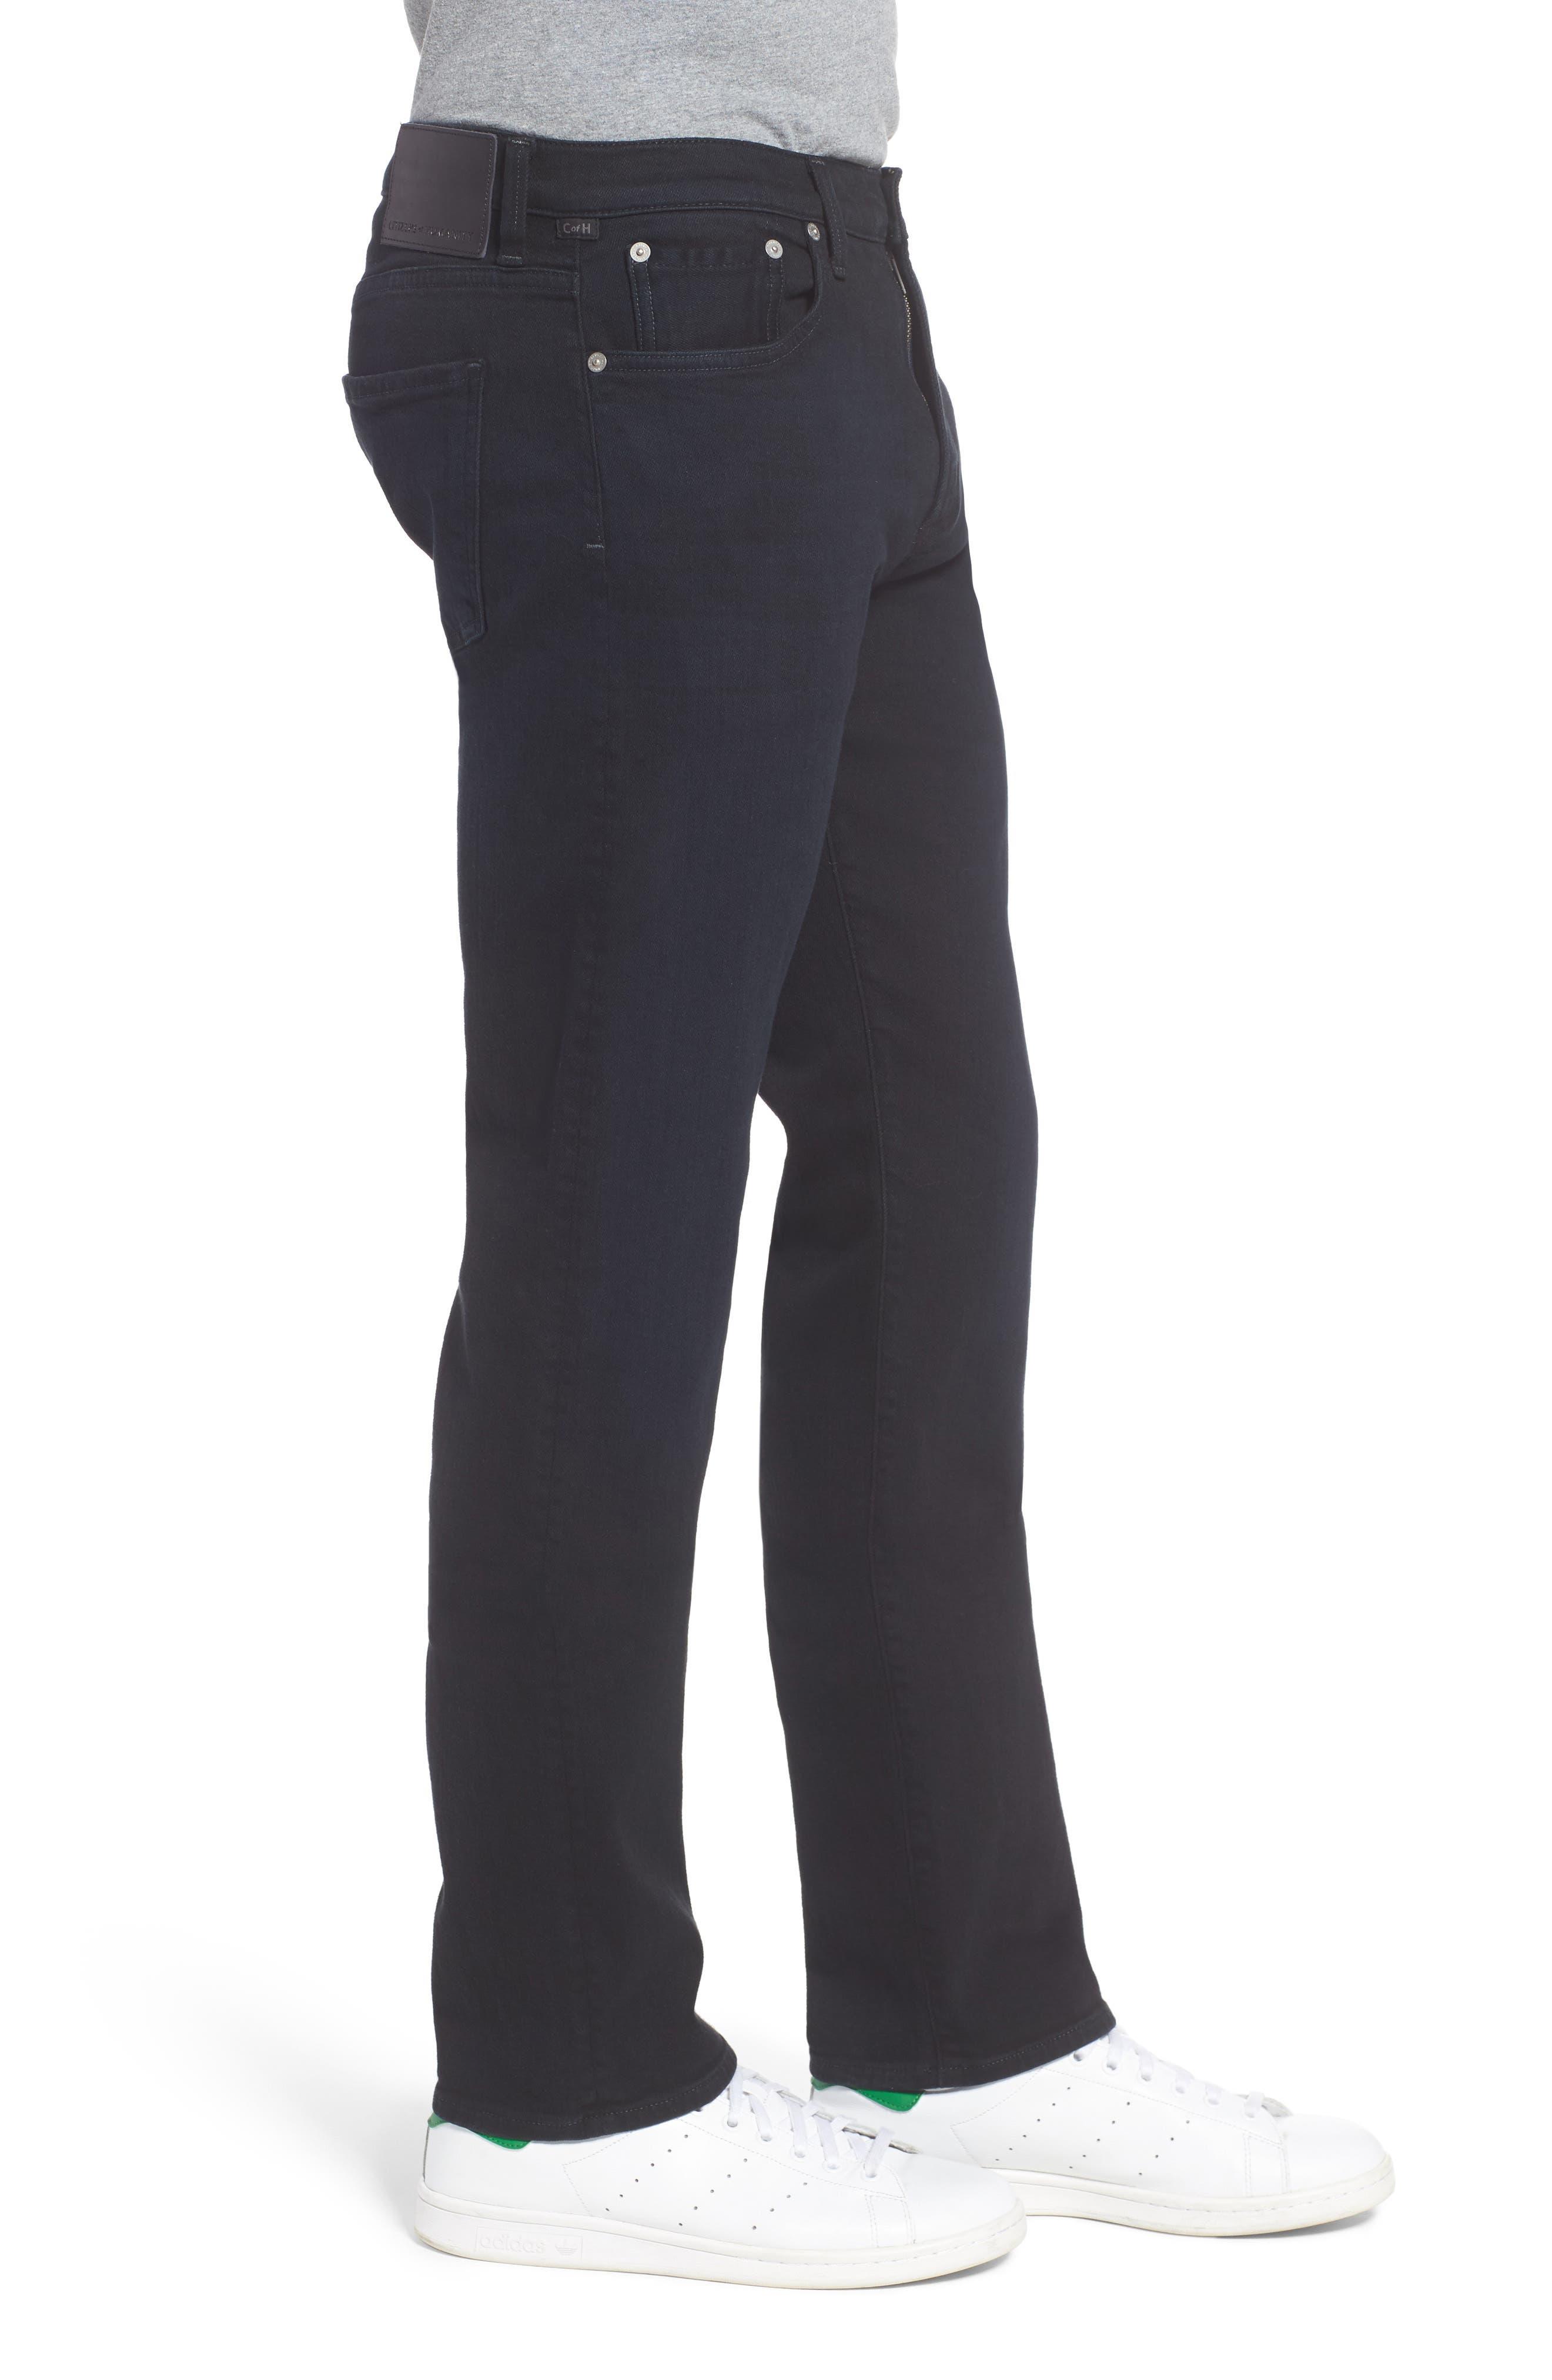 Gage Slim Straight Leg Jeans,                             Alternate thumbnail 3, color,                             401